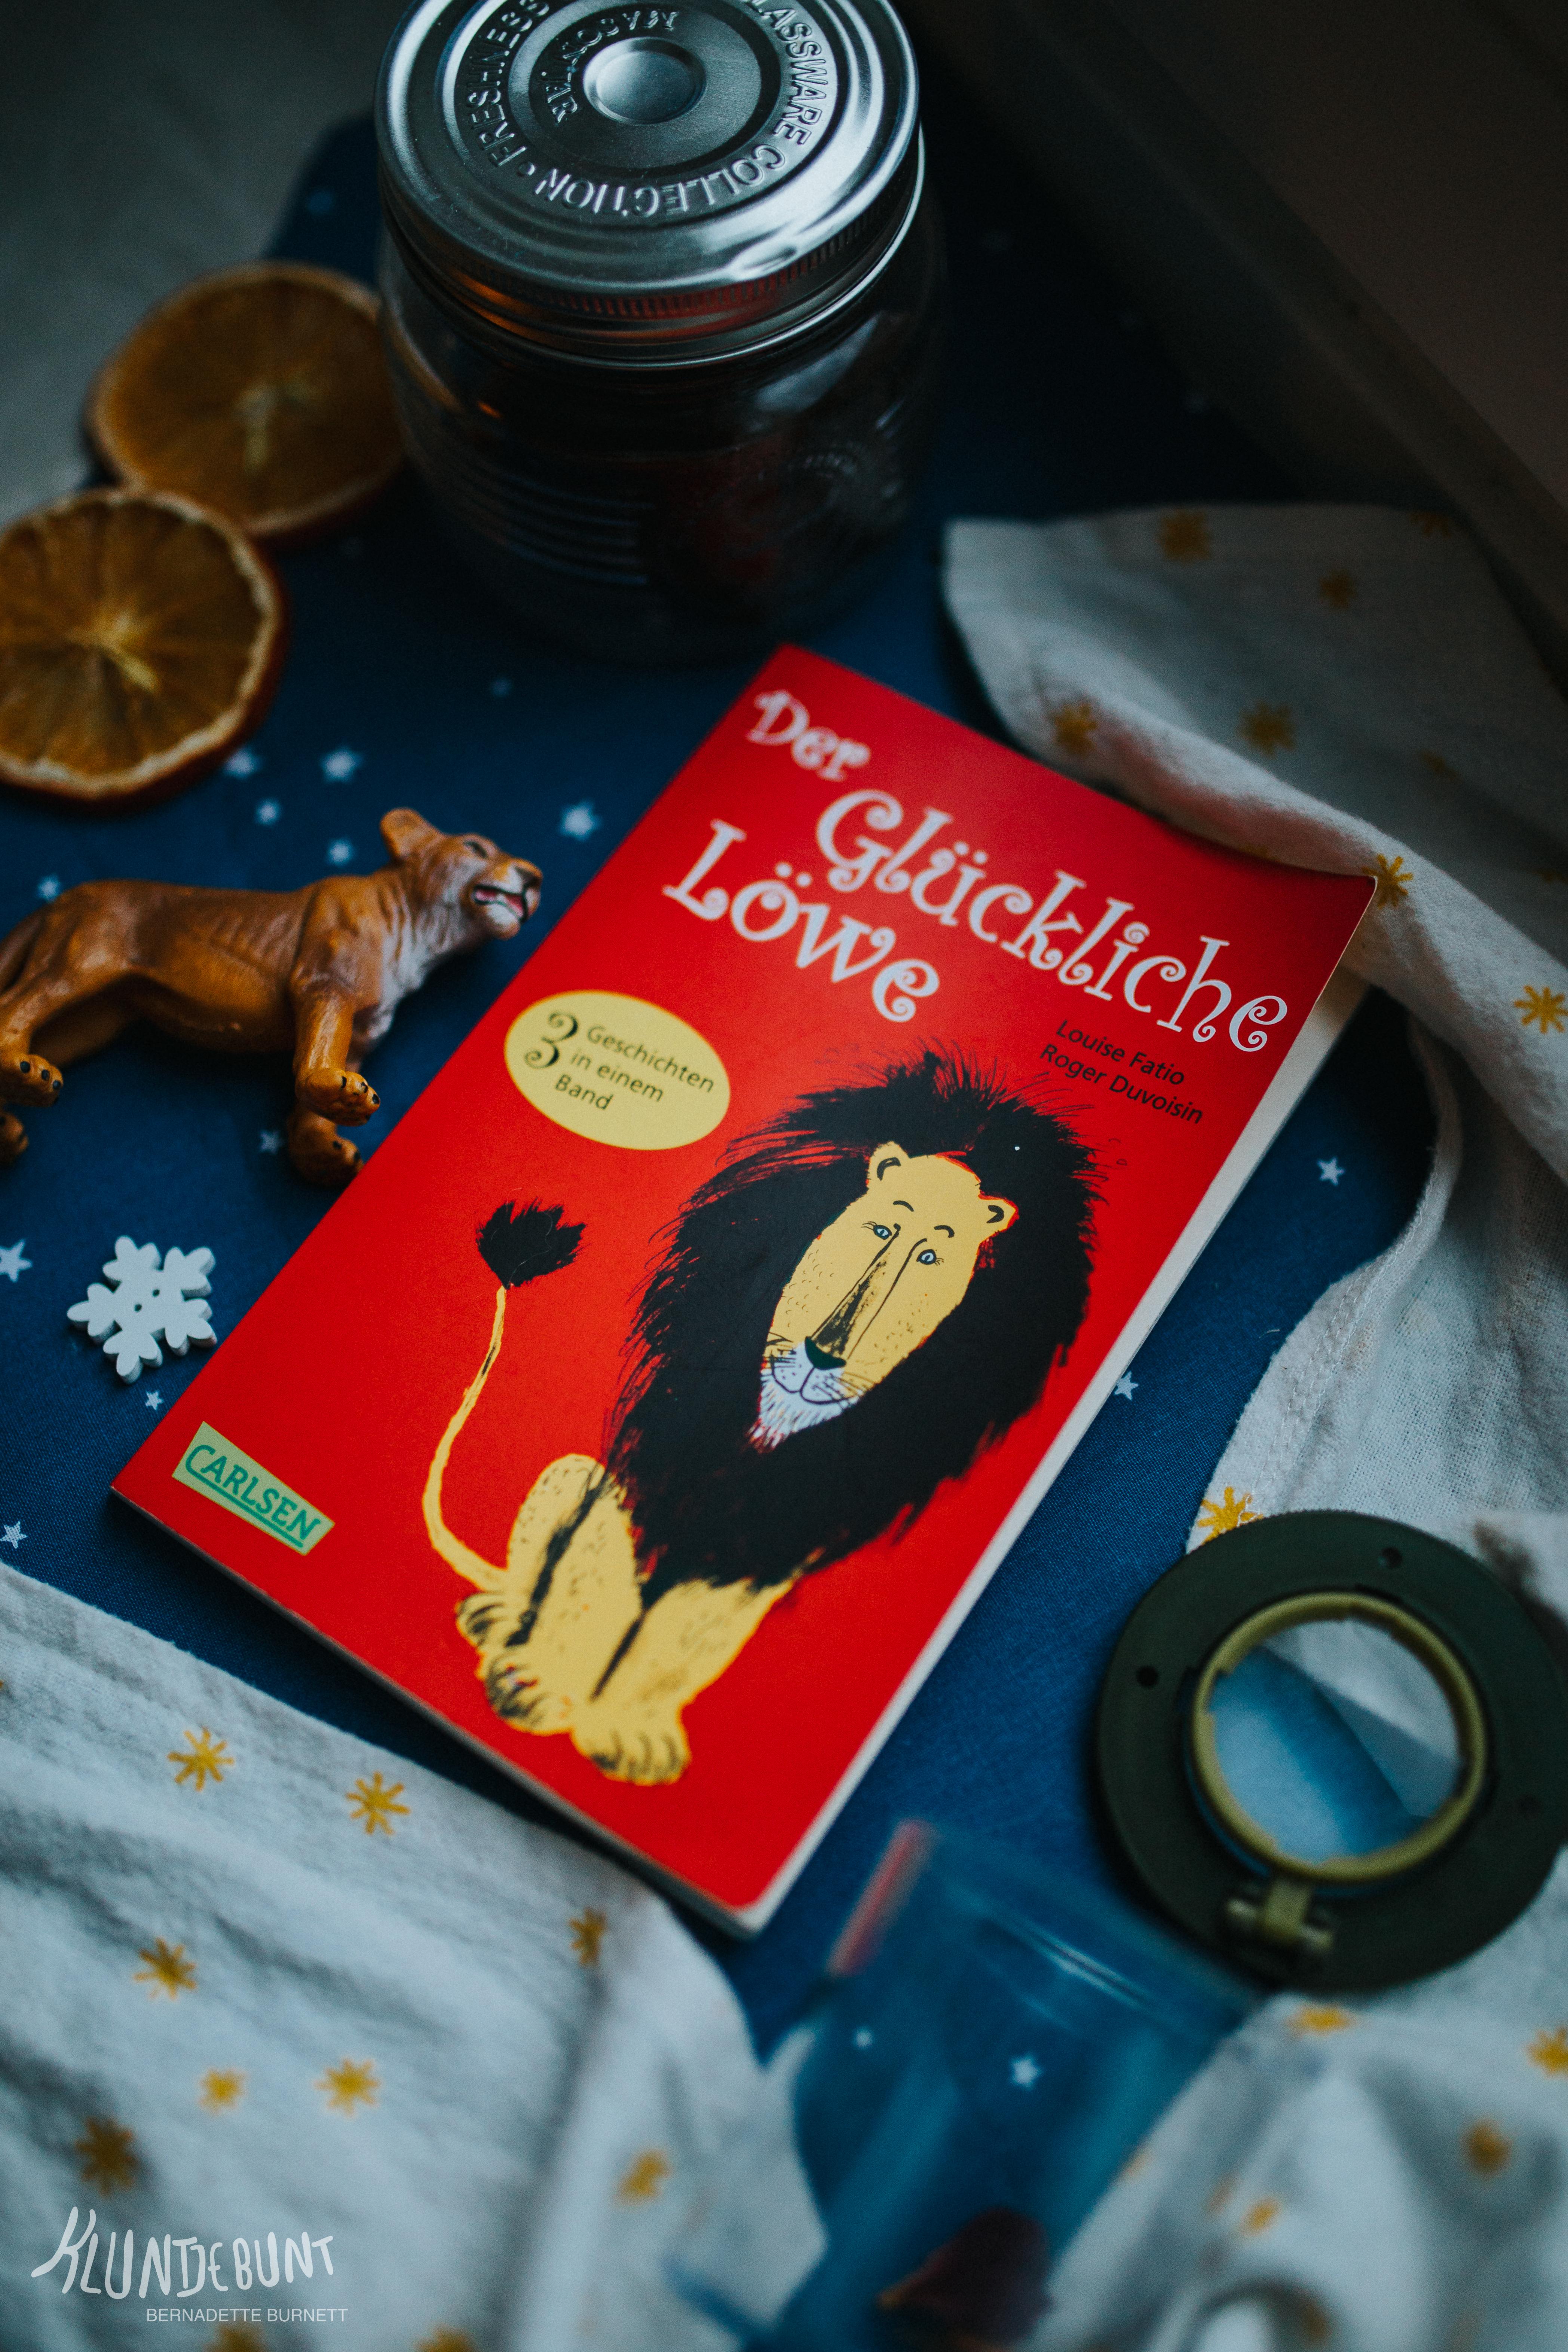 Kluntjebunt_At_Bernadette_Burnett_carlsenverlag_carlsen_dergluecklicheloewe_rezension_2_2017